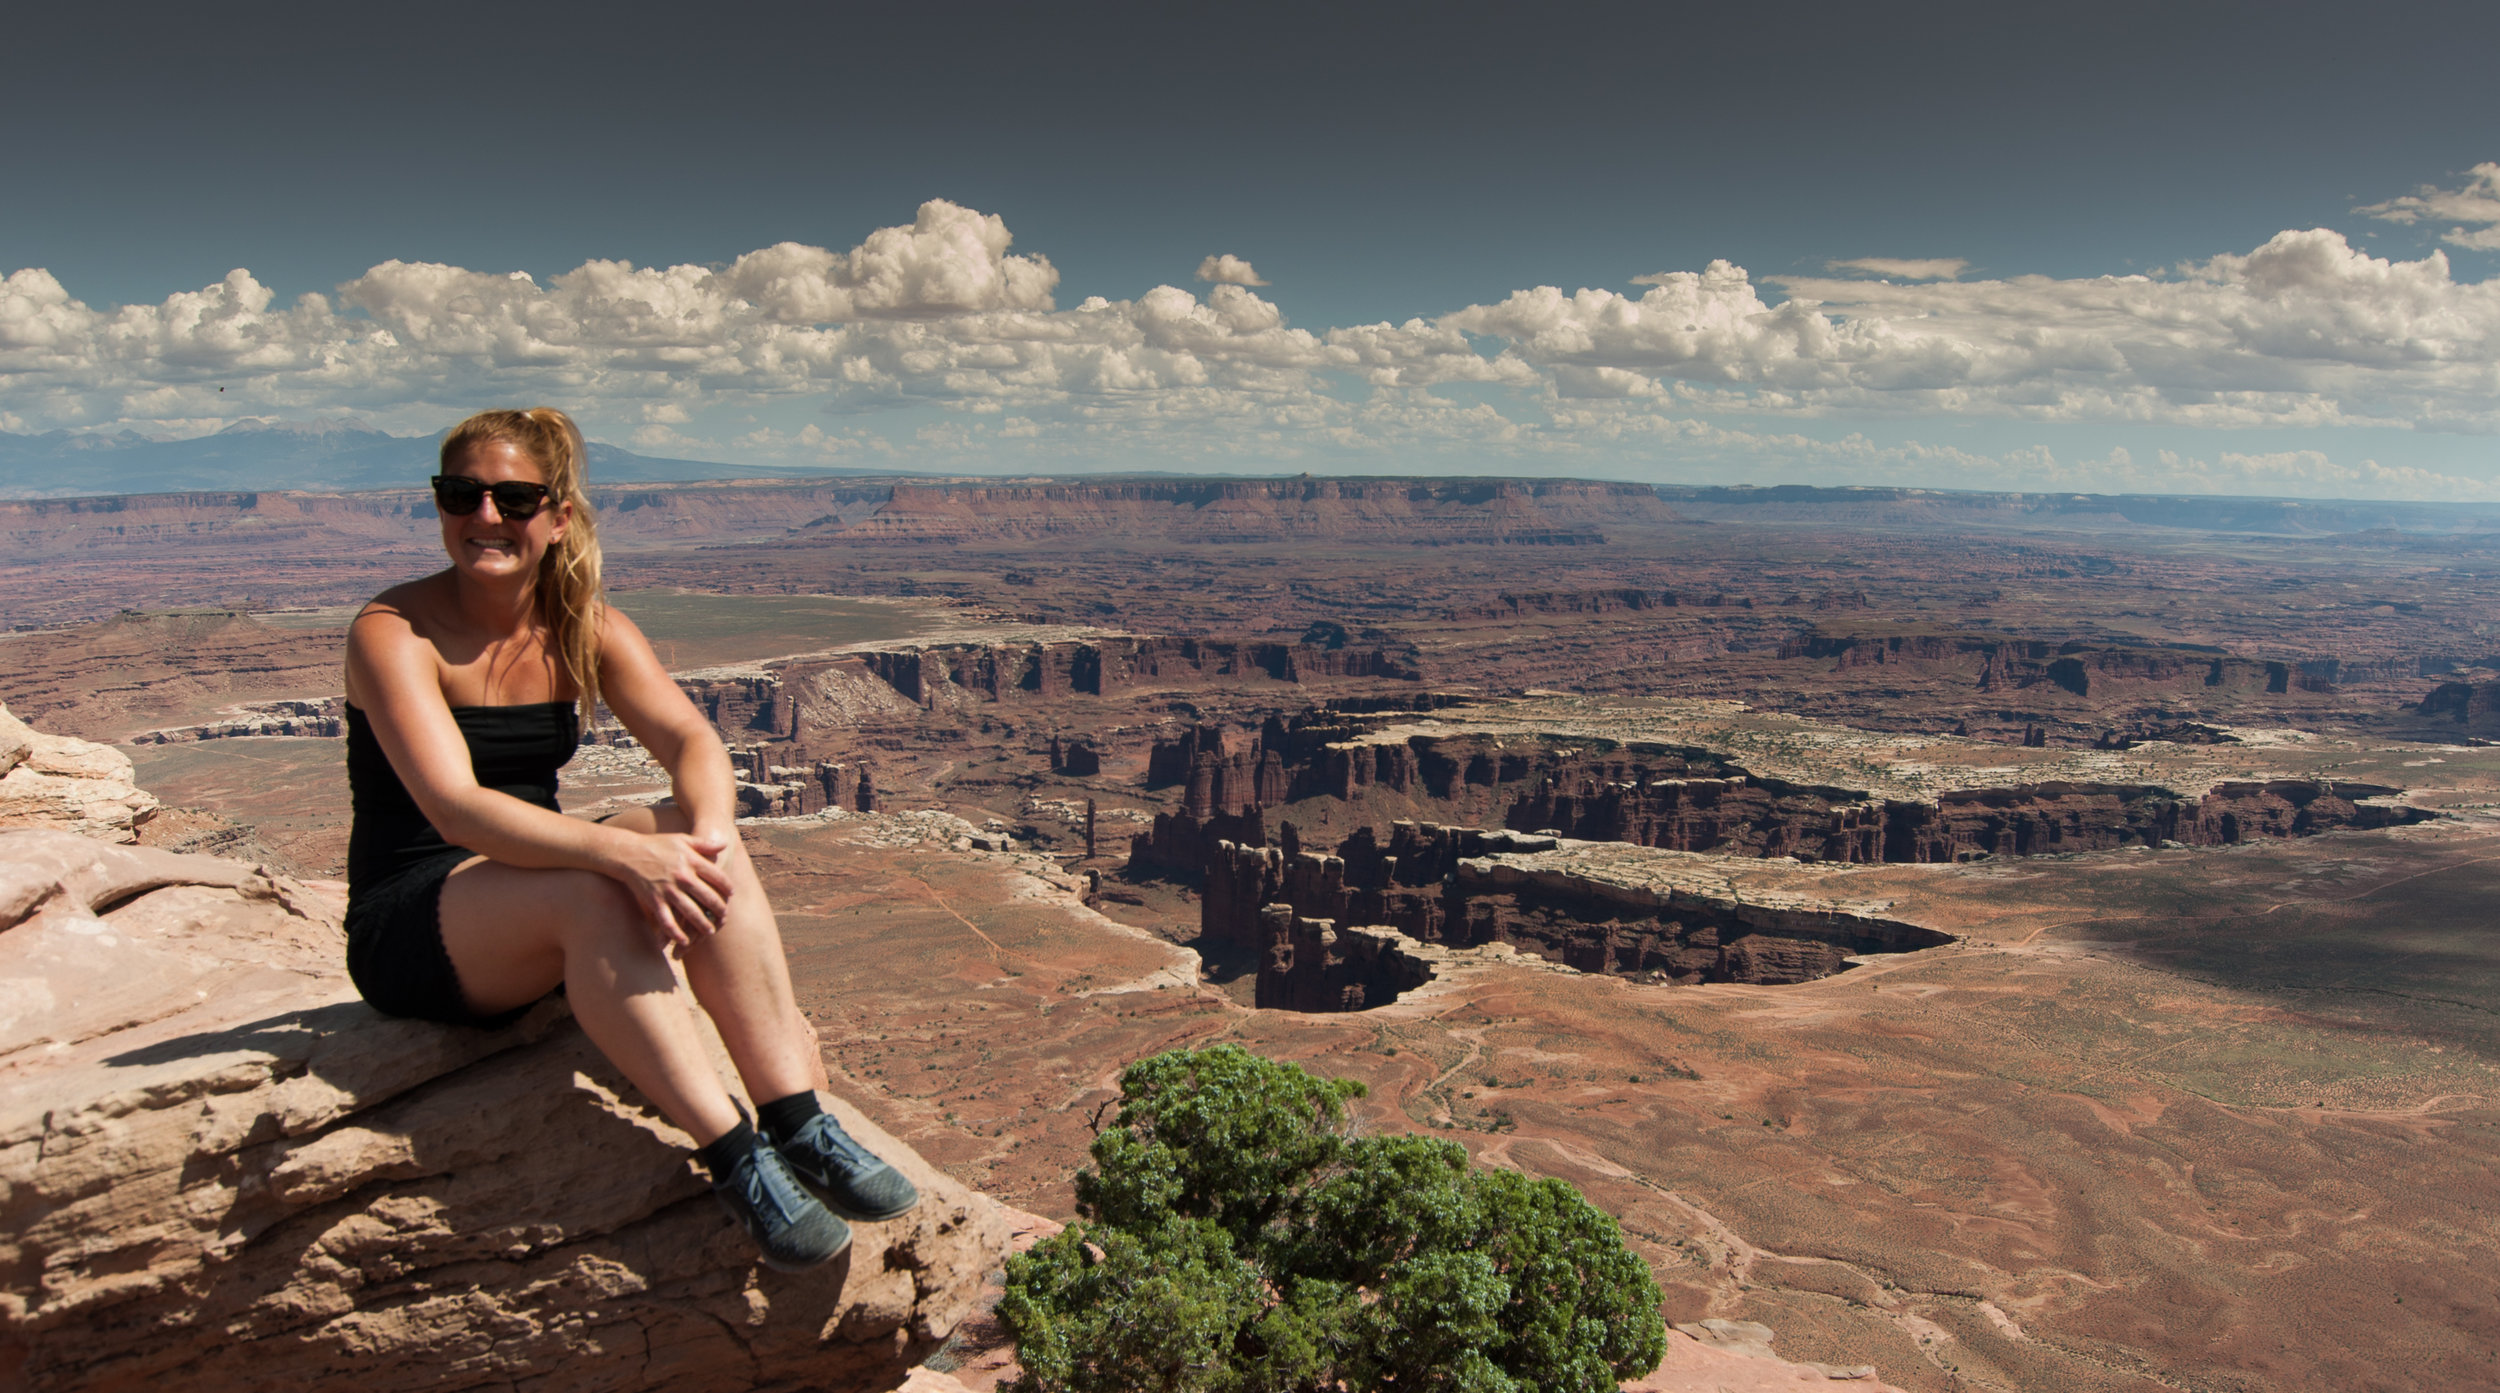 140914. CanyonlandsNP (130).jpg